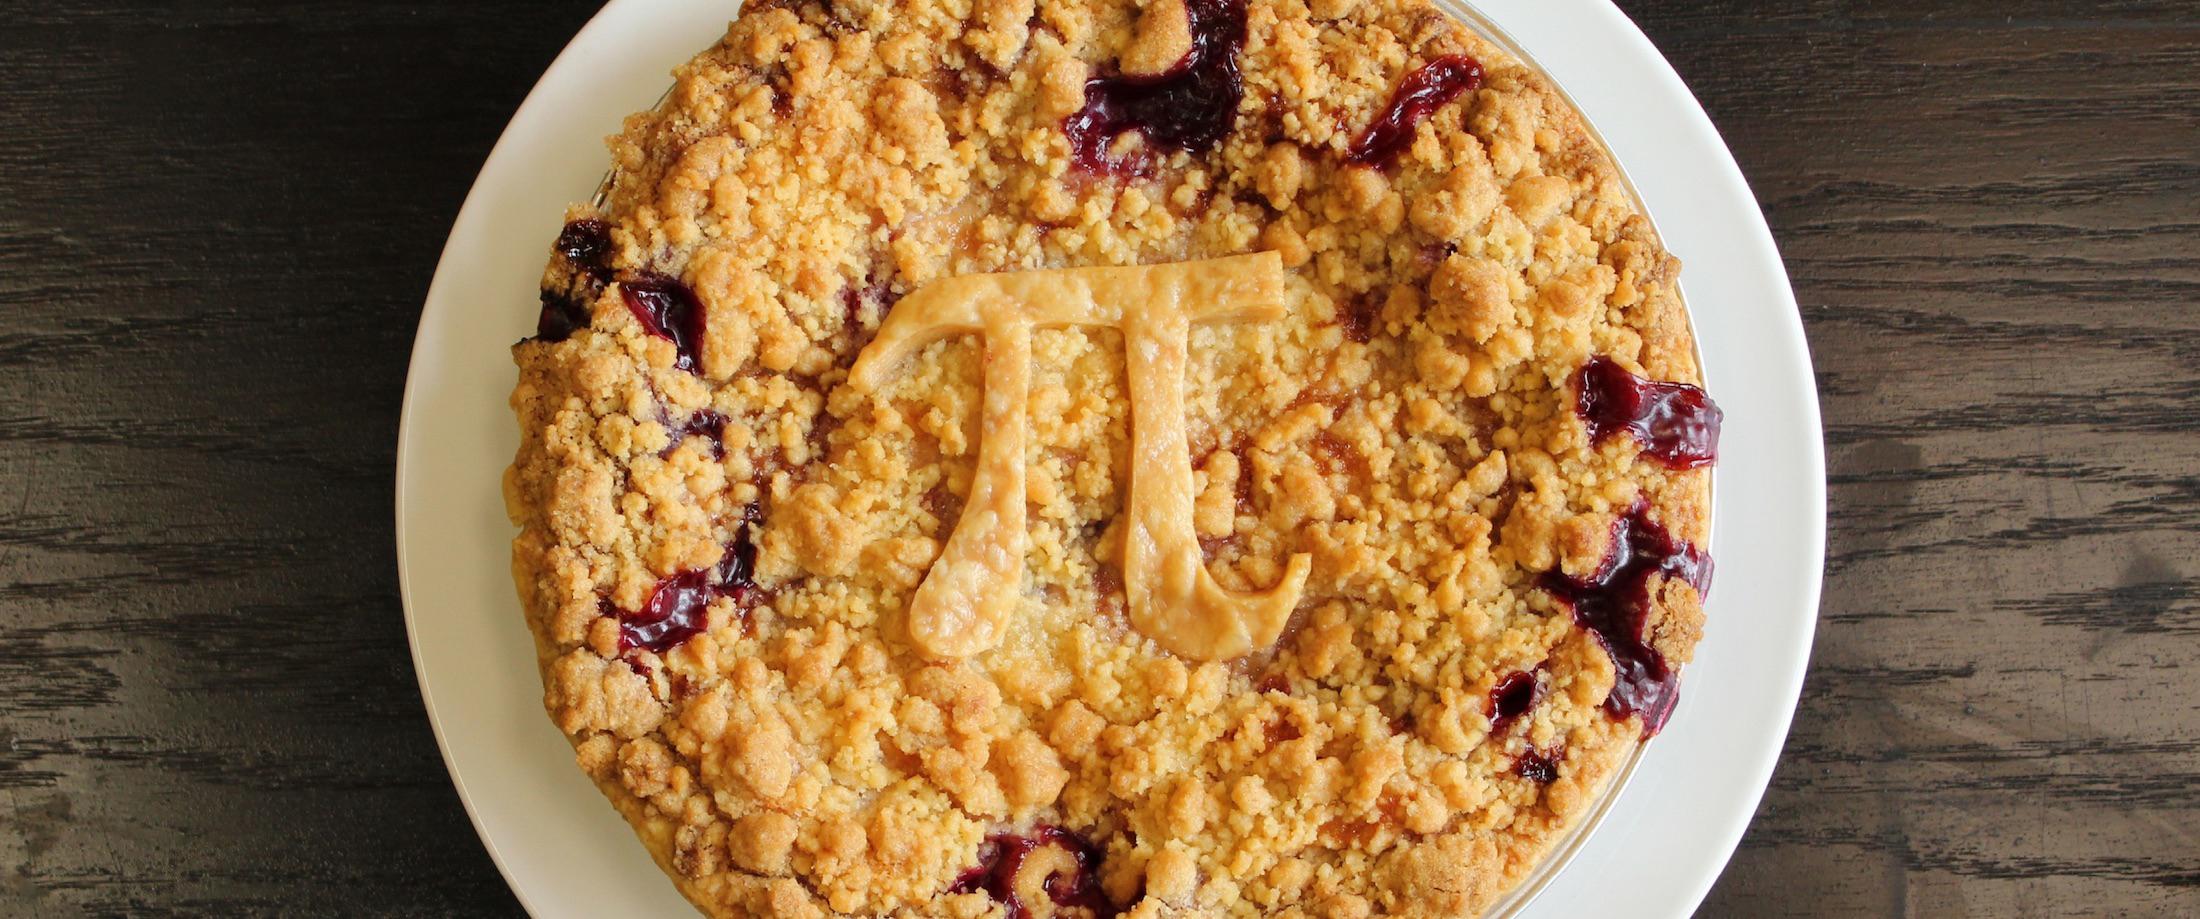 Pi Day at Grand Traverse Pie Company.